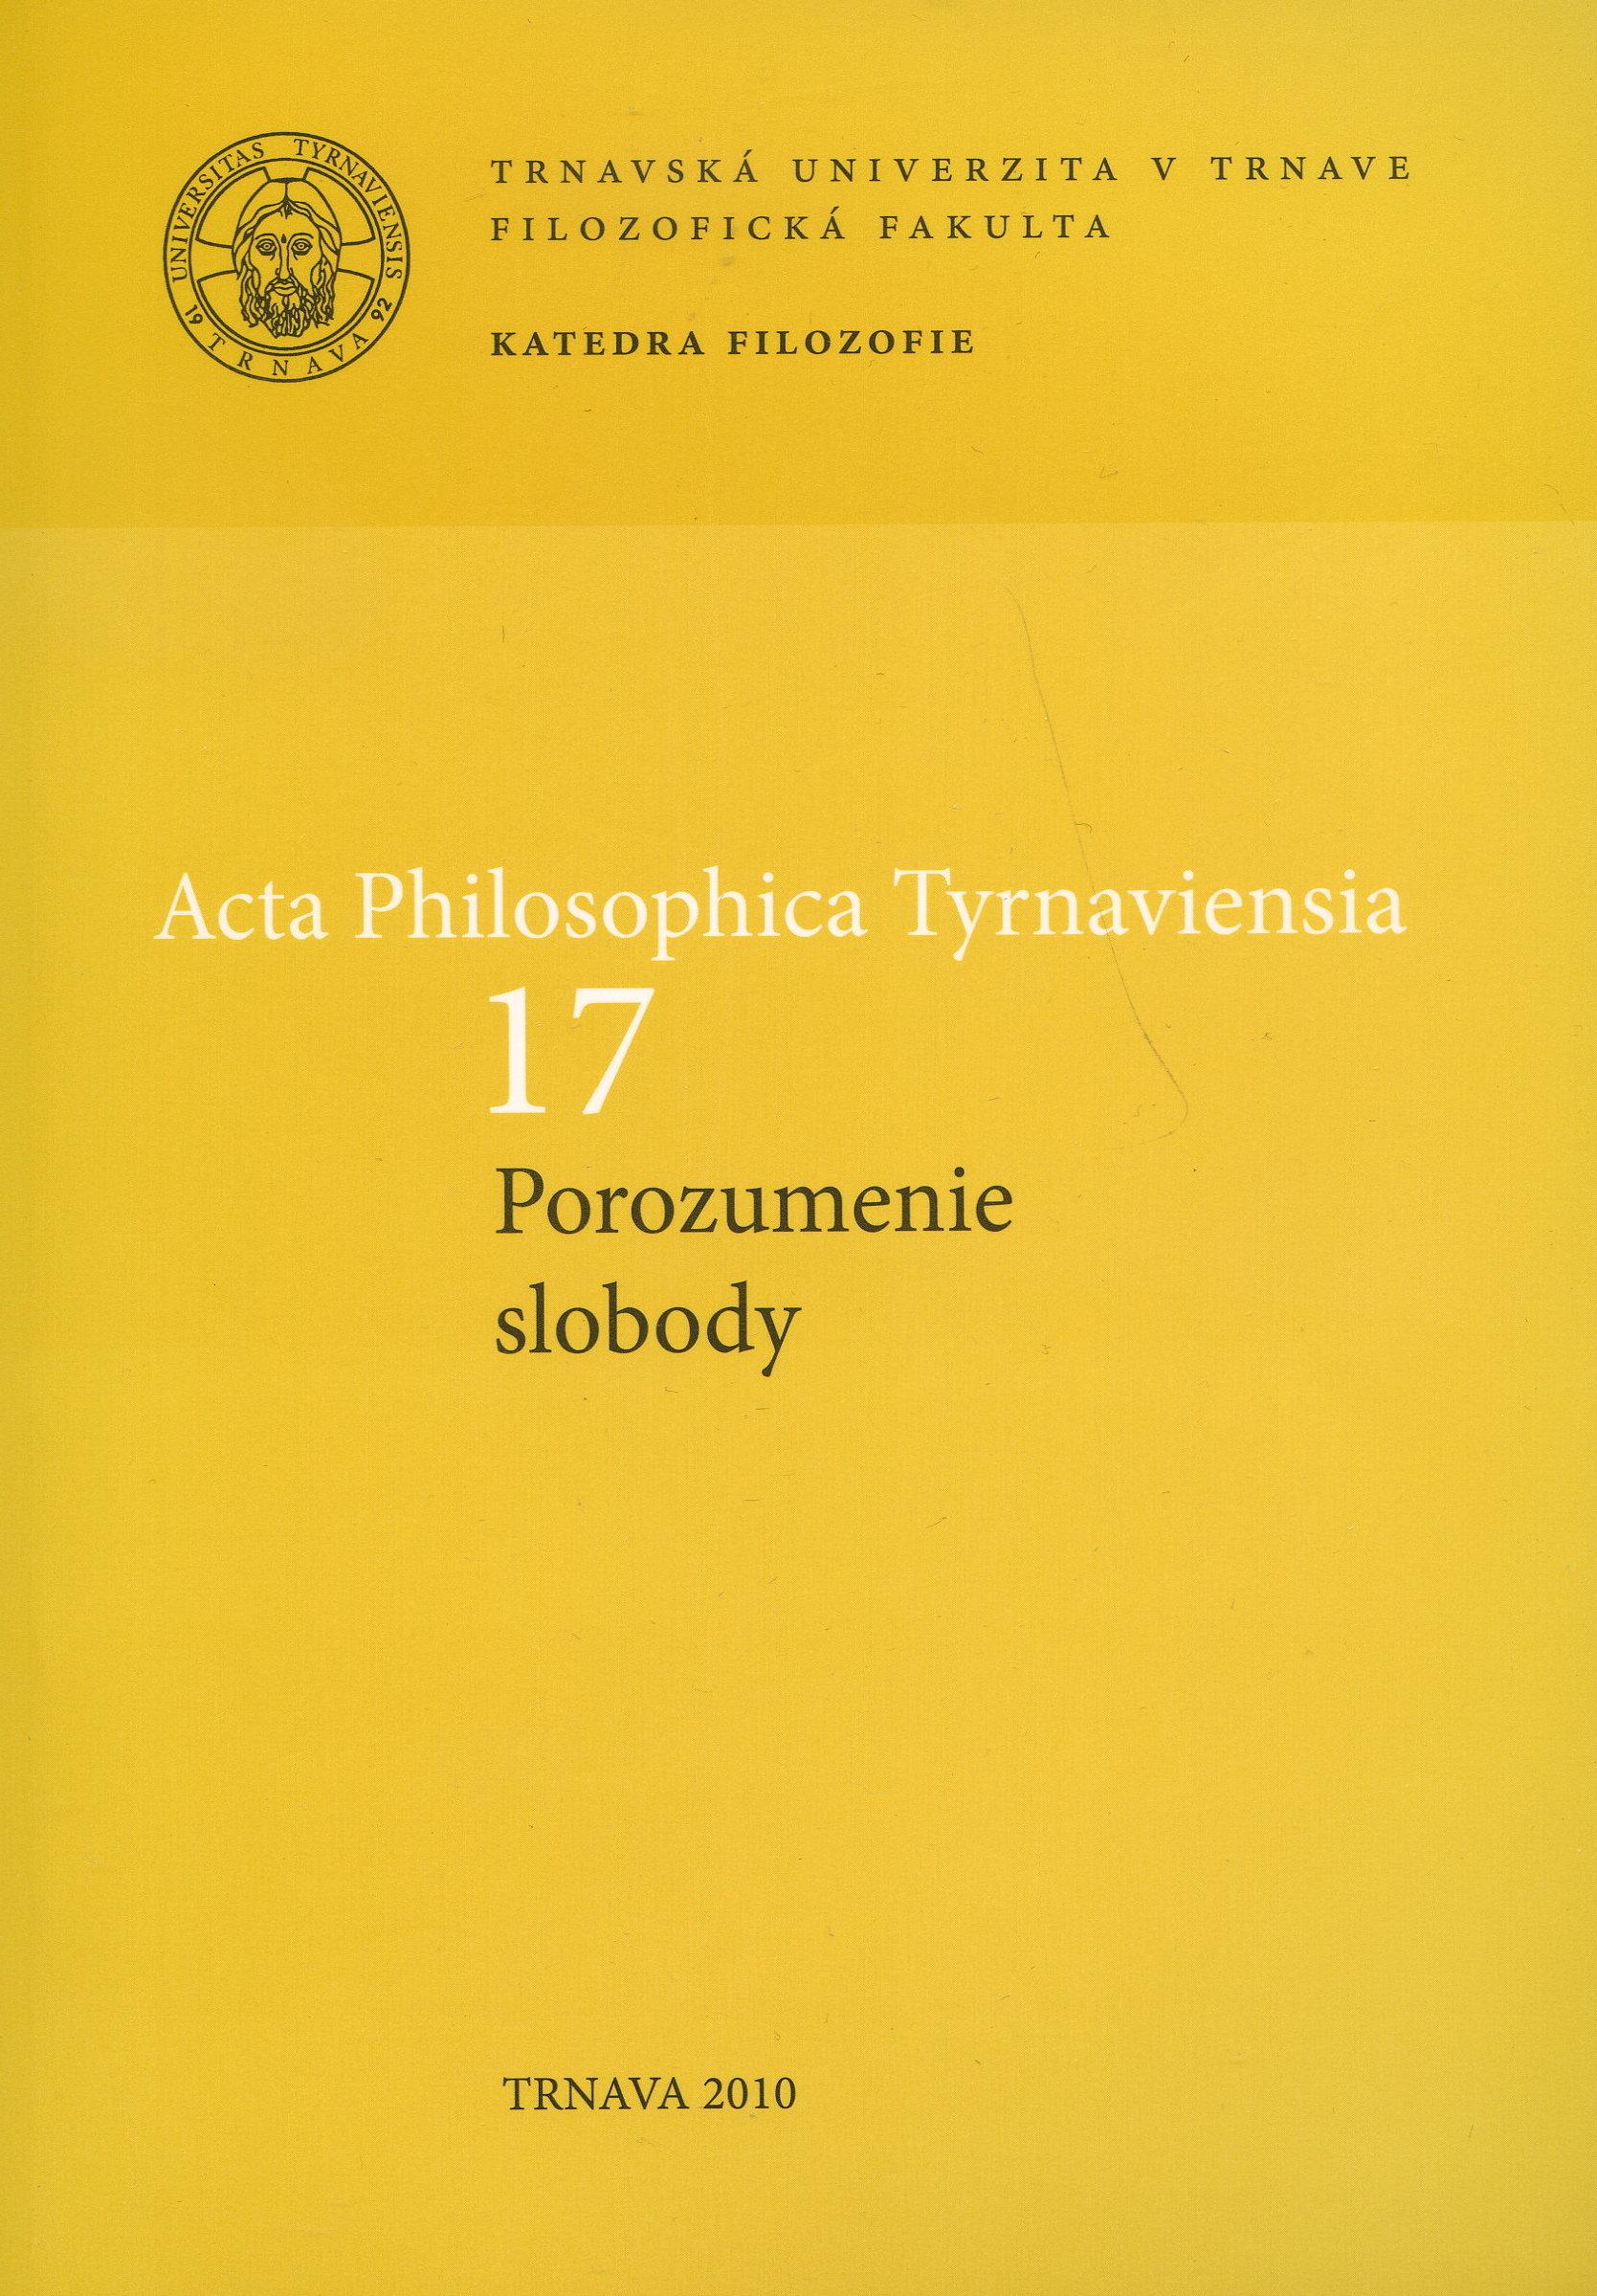 Acta philosophica Tyrnaviensia 17 - Porozumenie slobody